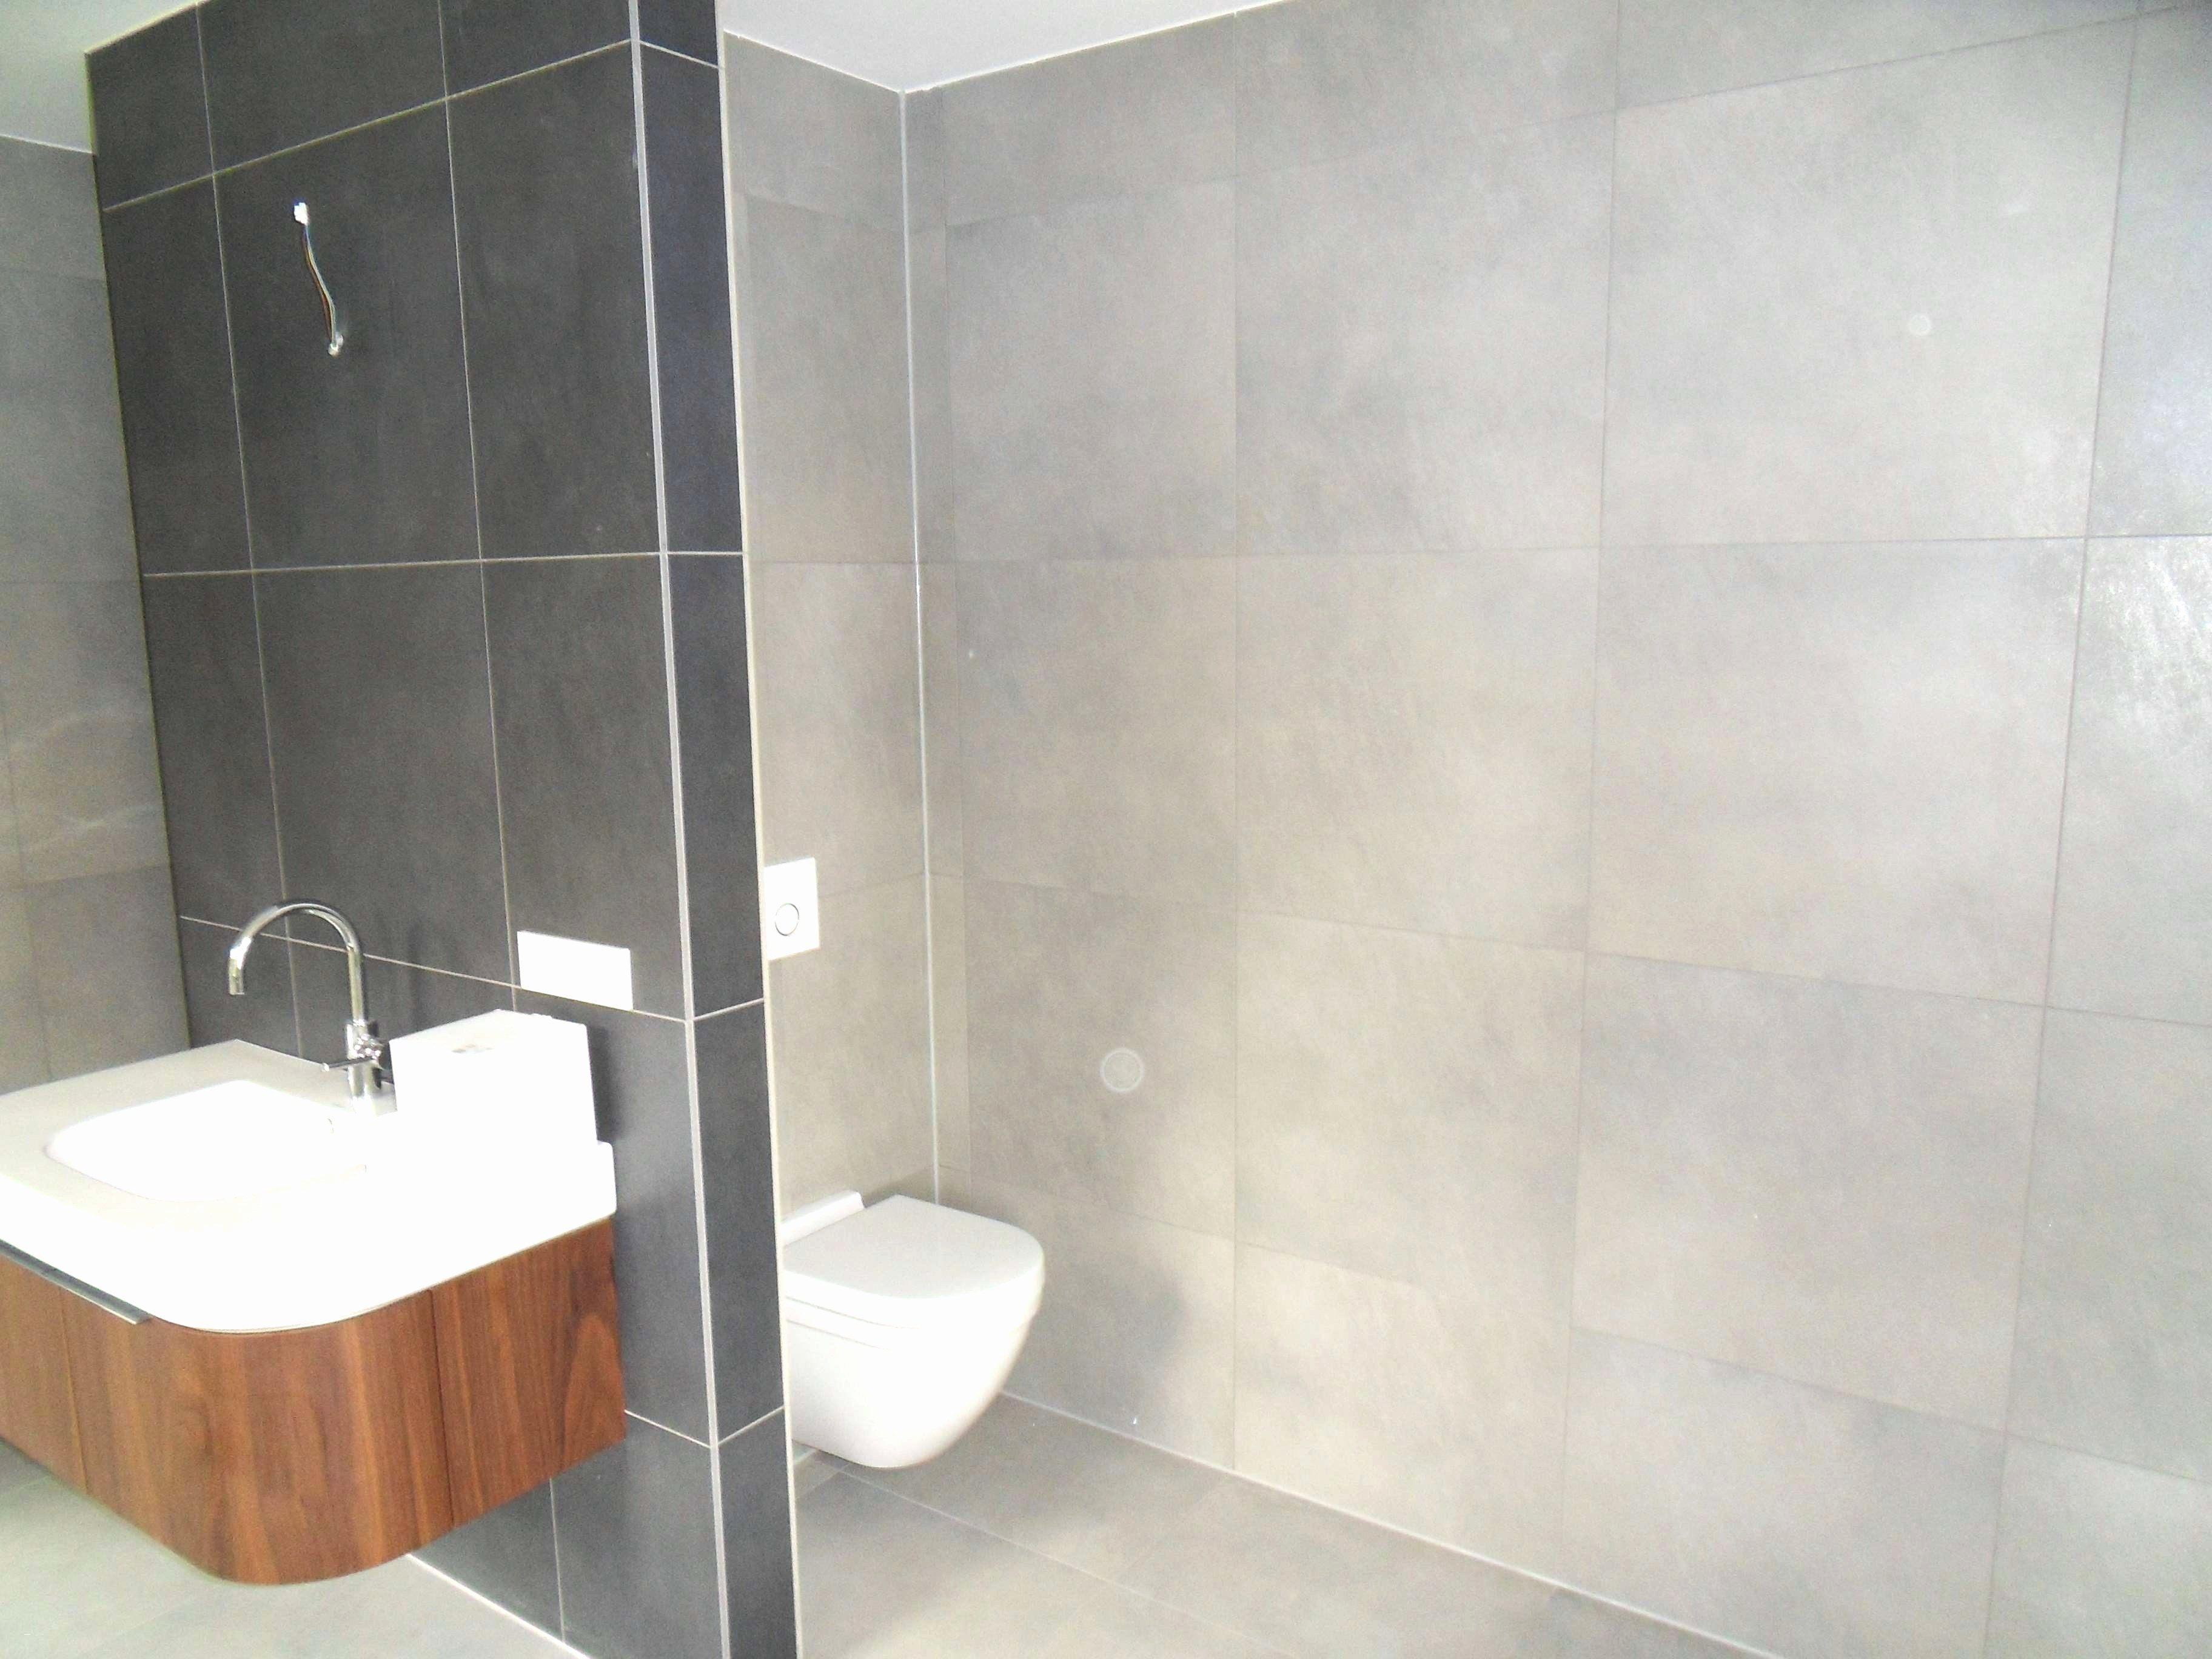 Badezimmer Paneele Statt Fliesen